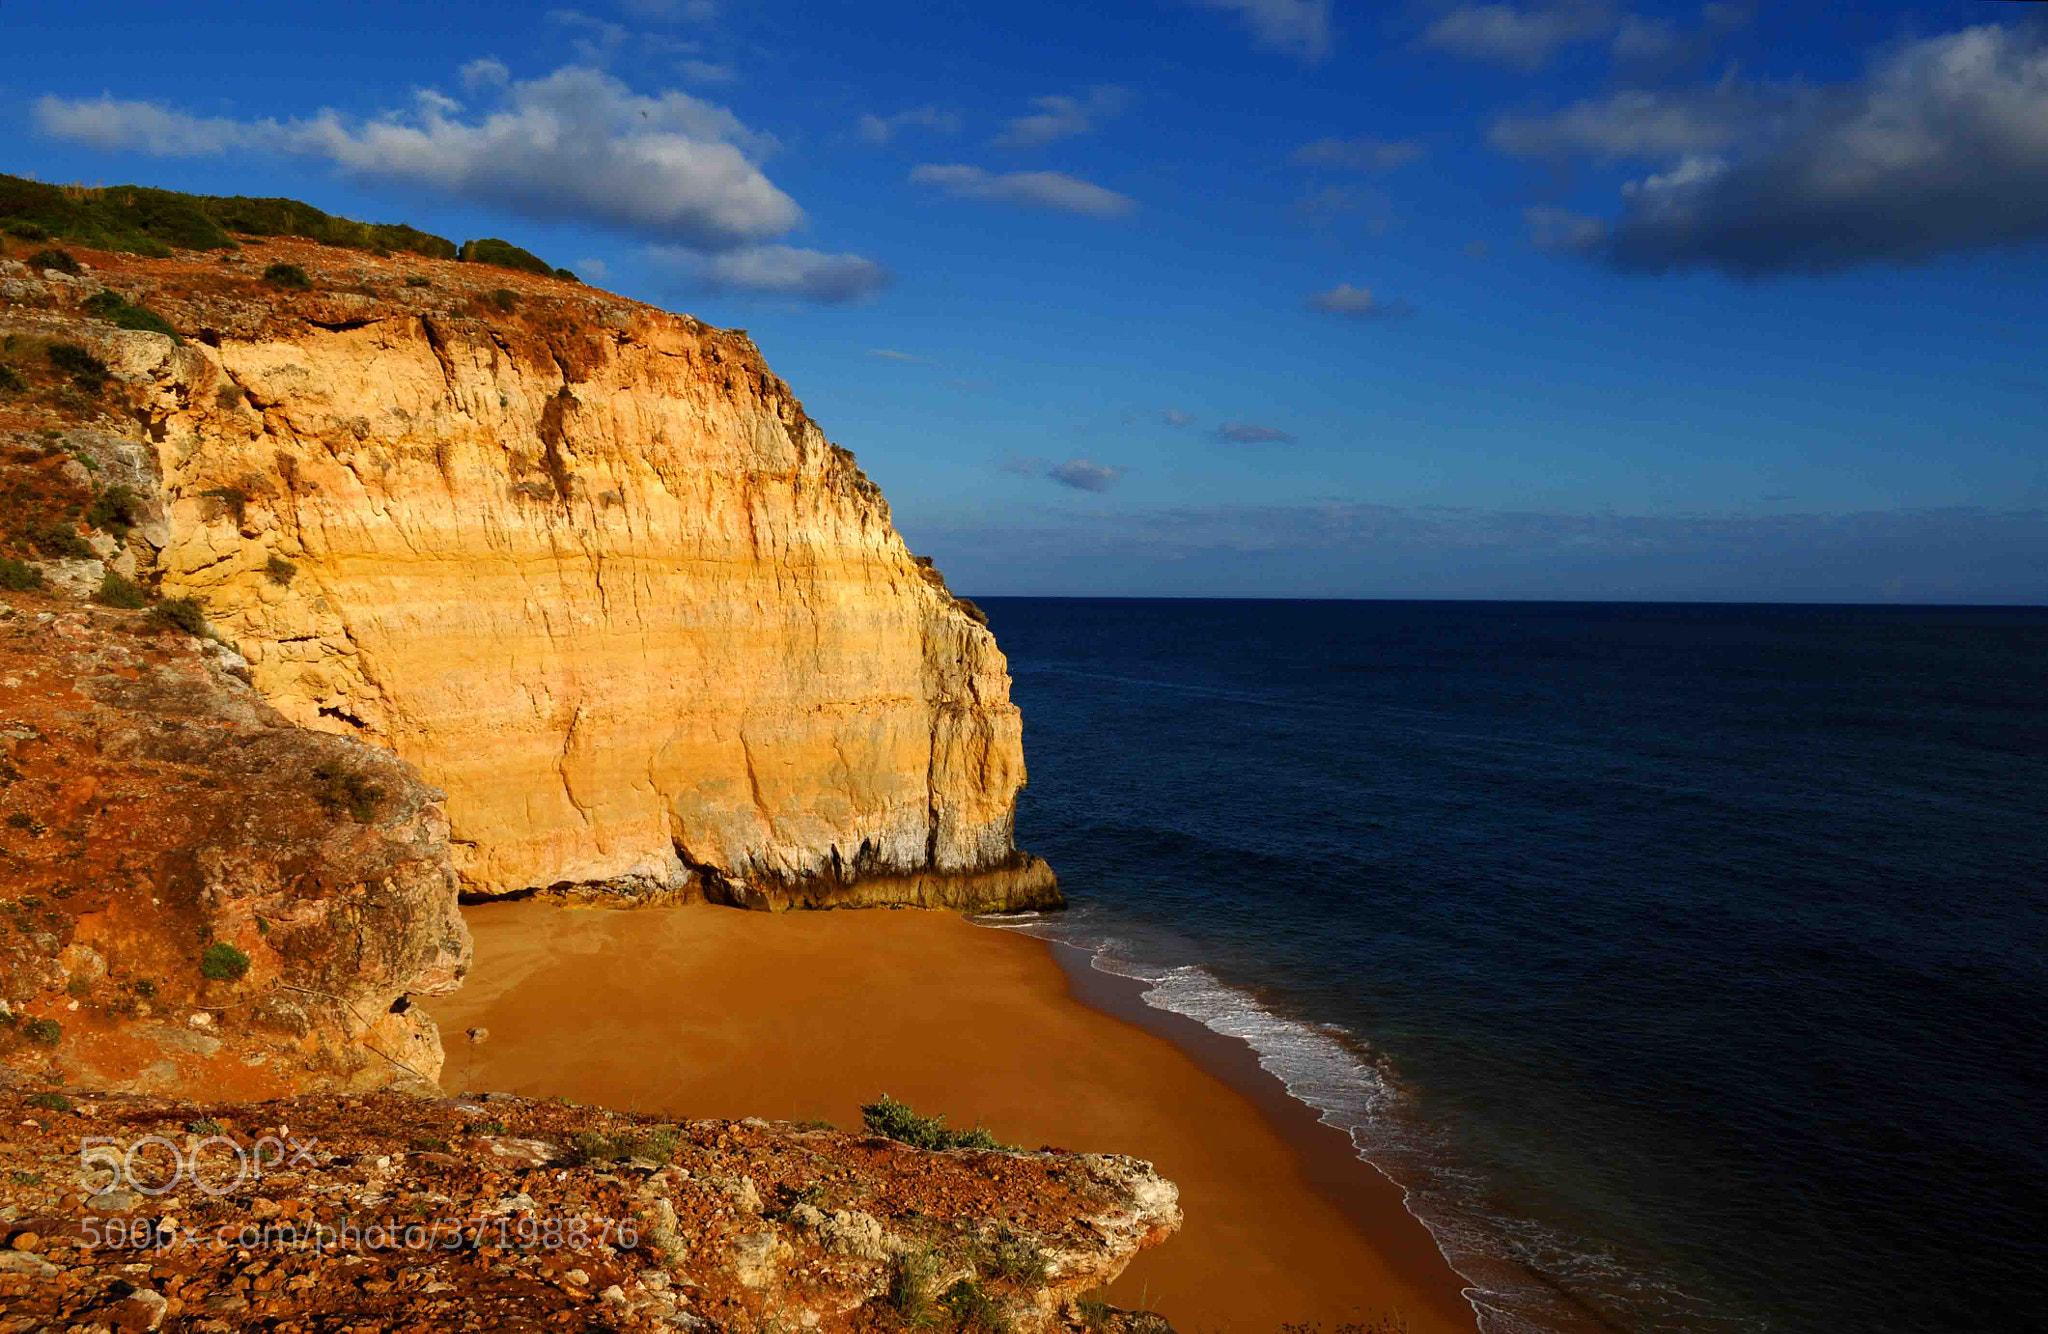 Photograph Beach between cliffs by José Eusébio on 500px